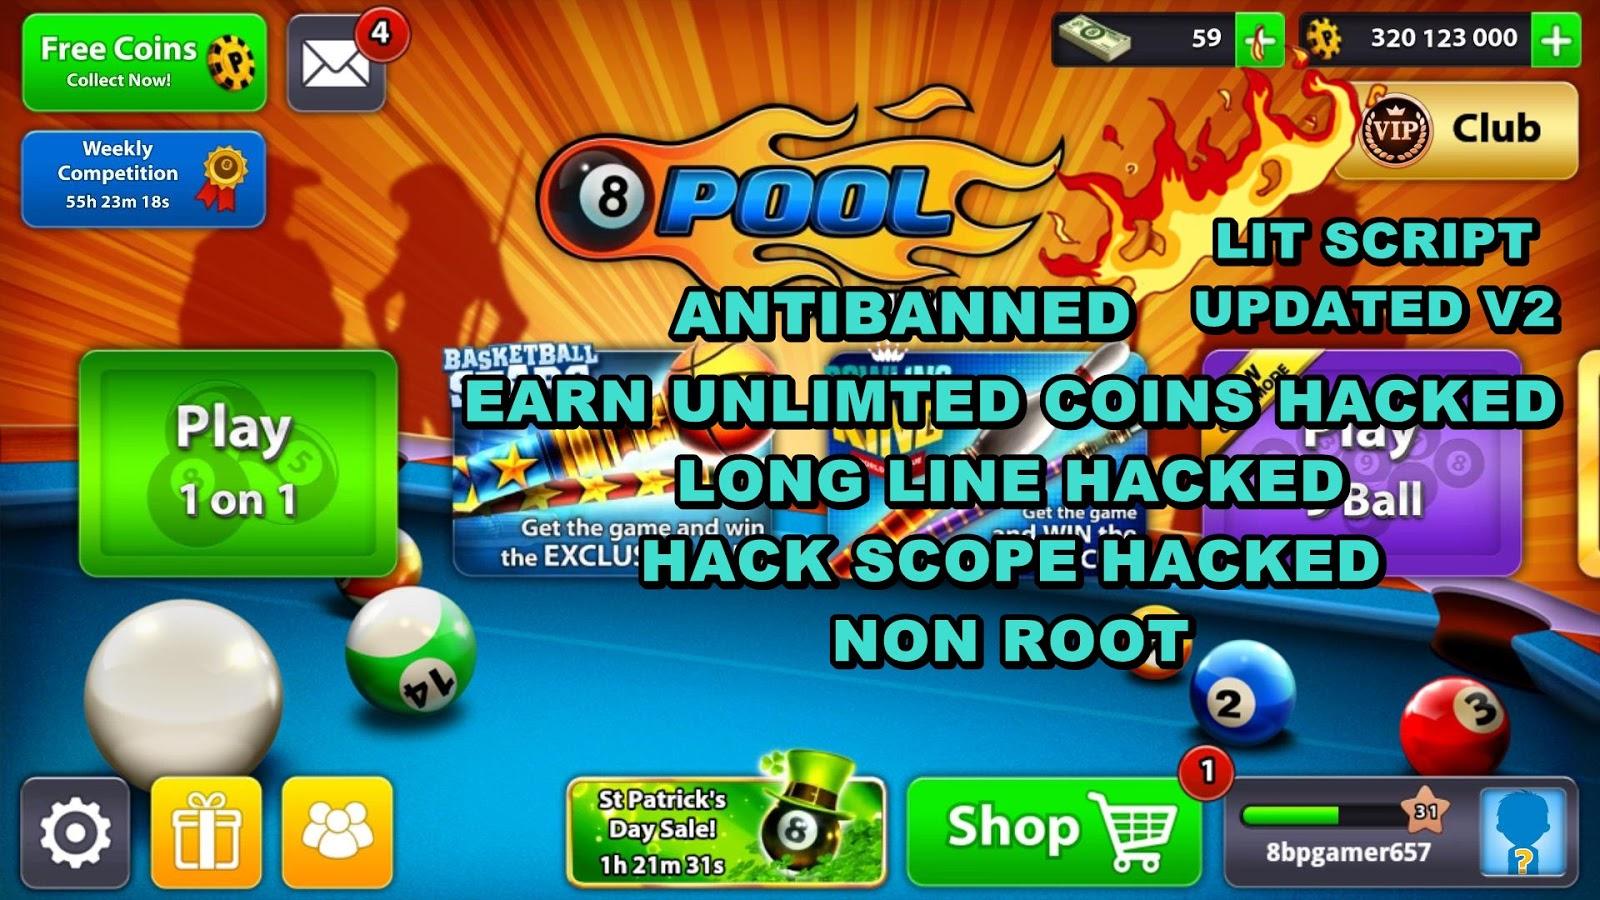 Top 10 Punto Medio Noticias | Hack 8 Ball Pool Using Game Guardian